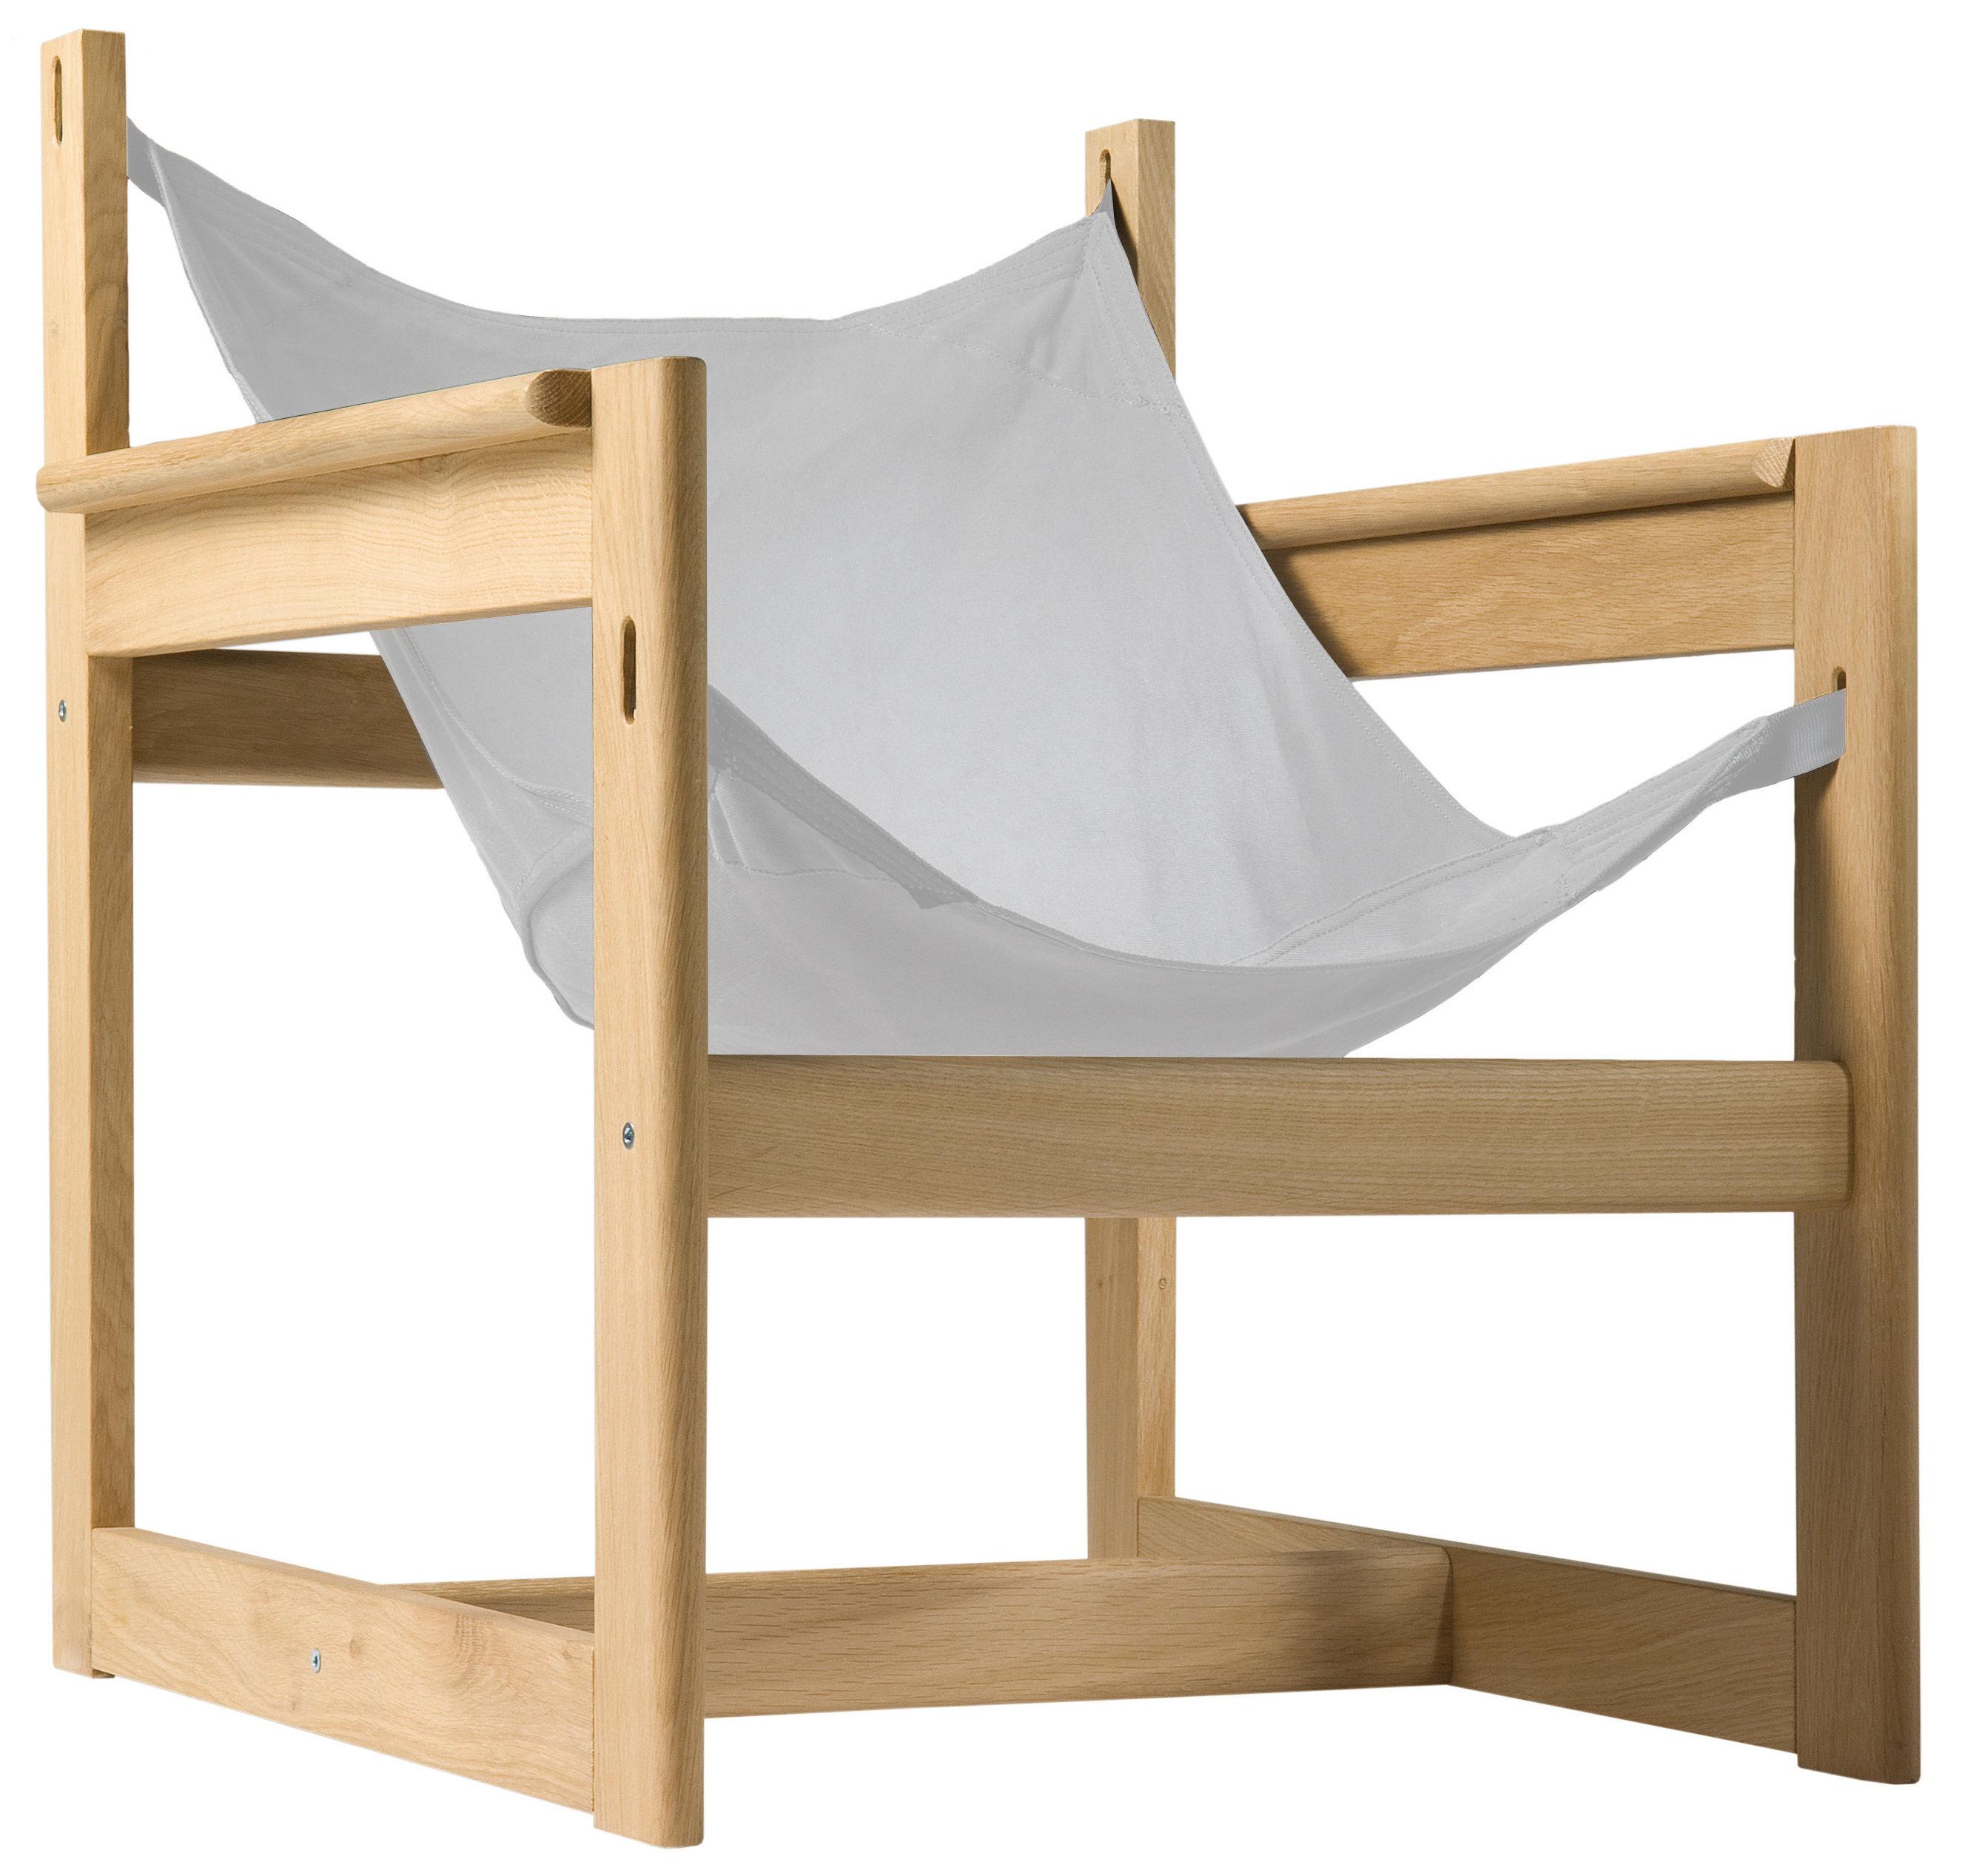 Furniture - Armchairs - Pelicano Armchair - Armchair by Objekto - Oak structure / Raw cotton seat - Cotton, Oak